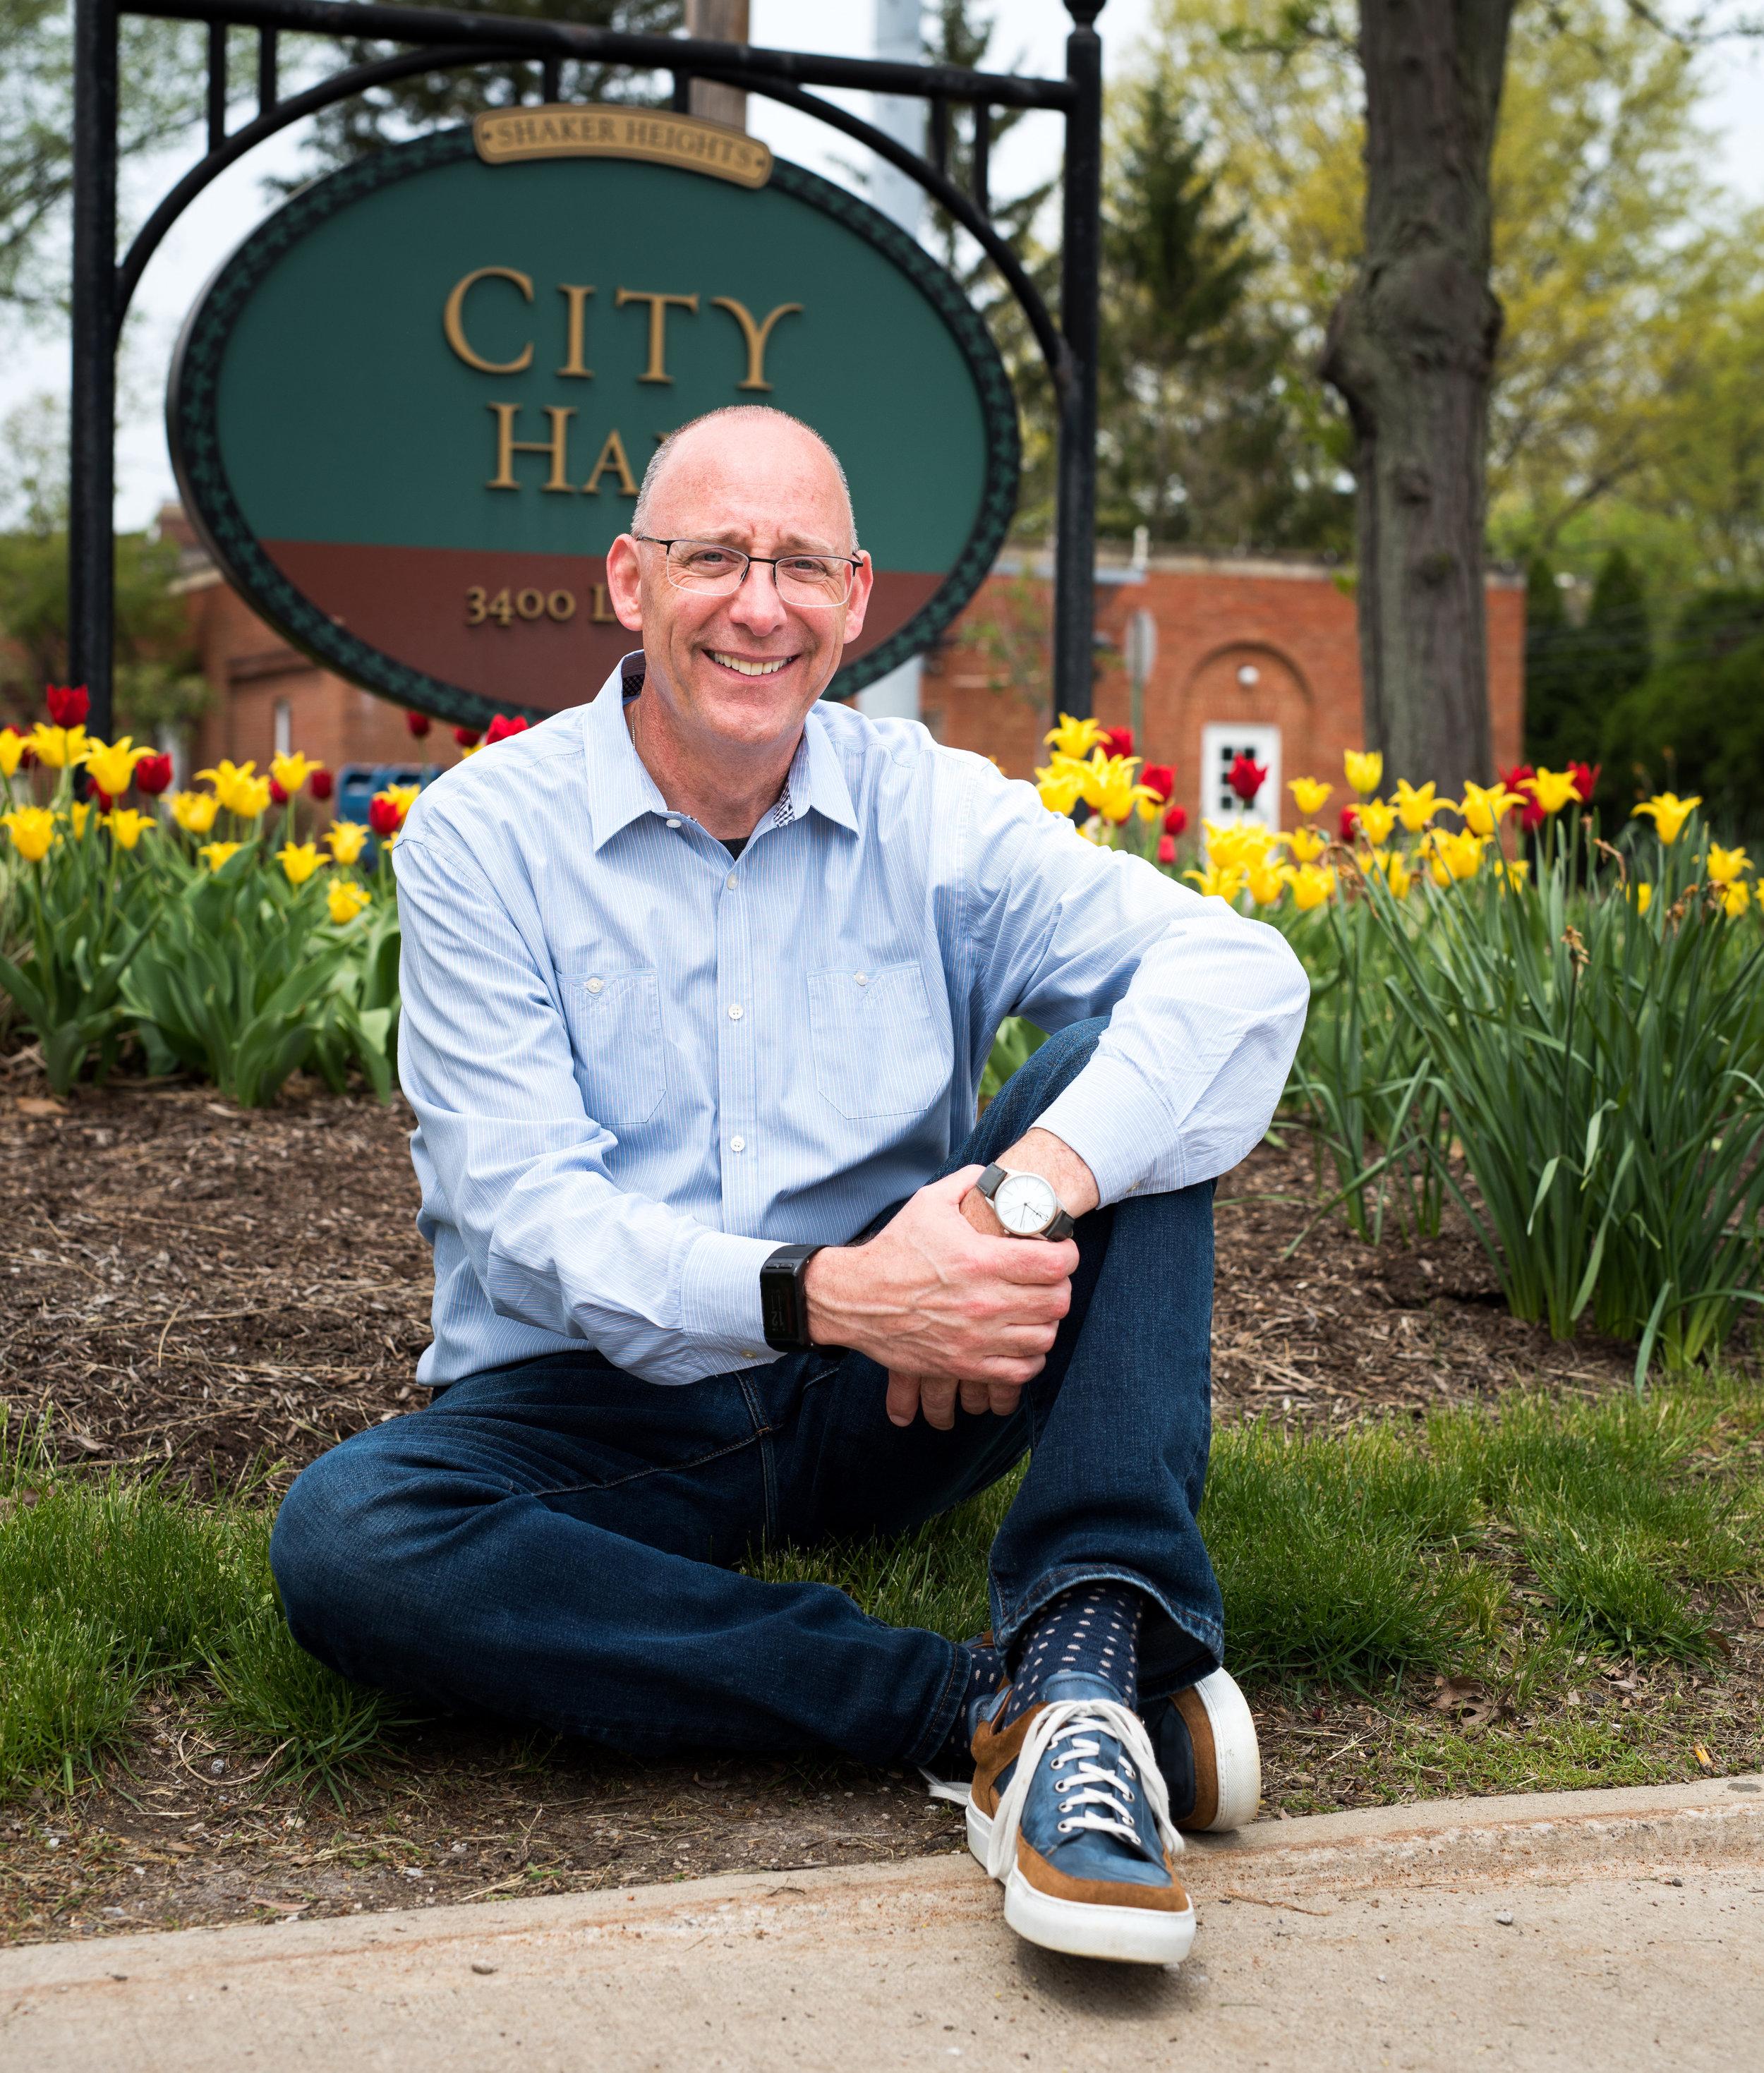 Shaker Heights Mayor David Weiss